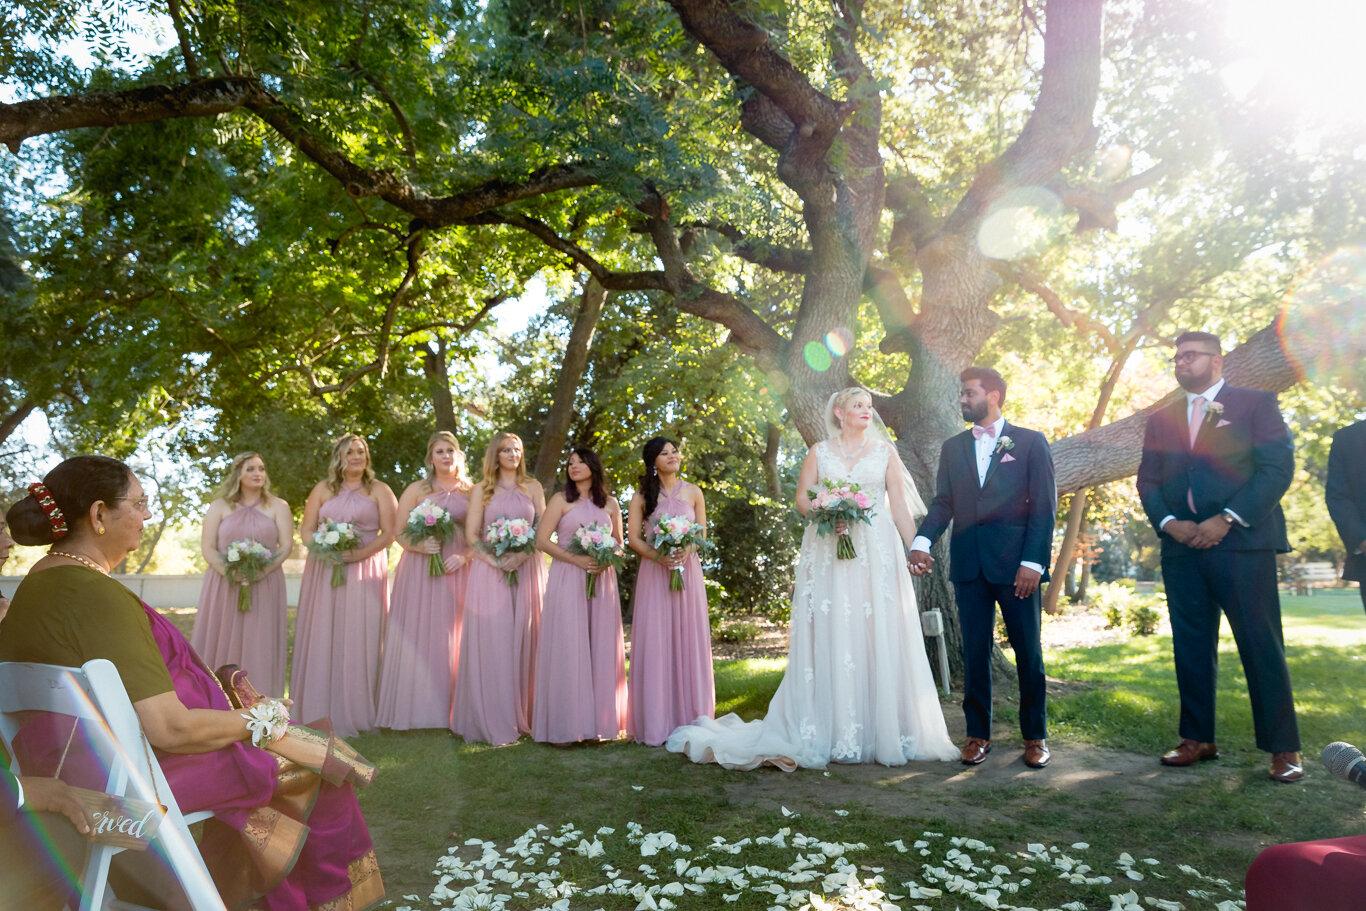 2019.08.24_Emily-Ashir-Wedding-at-the-Maples-5796.jpg